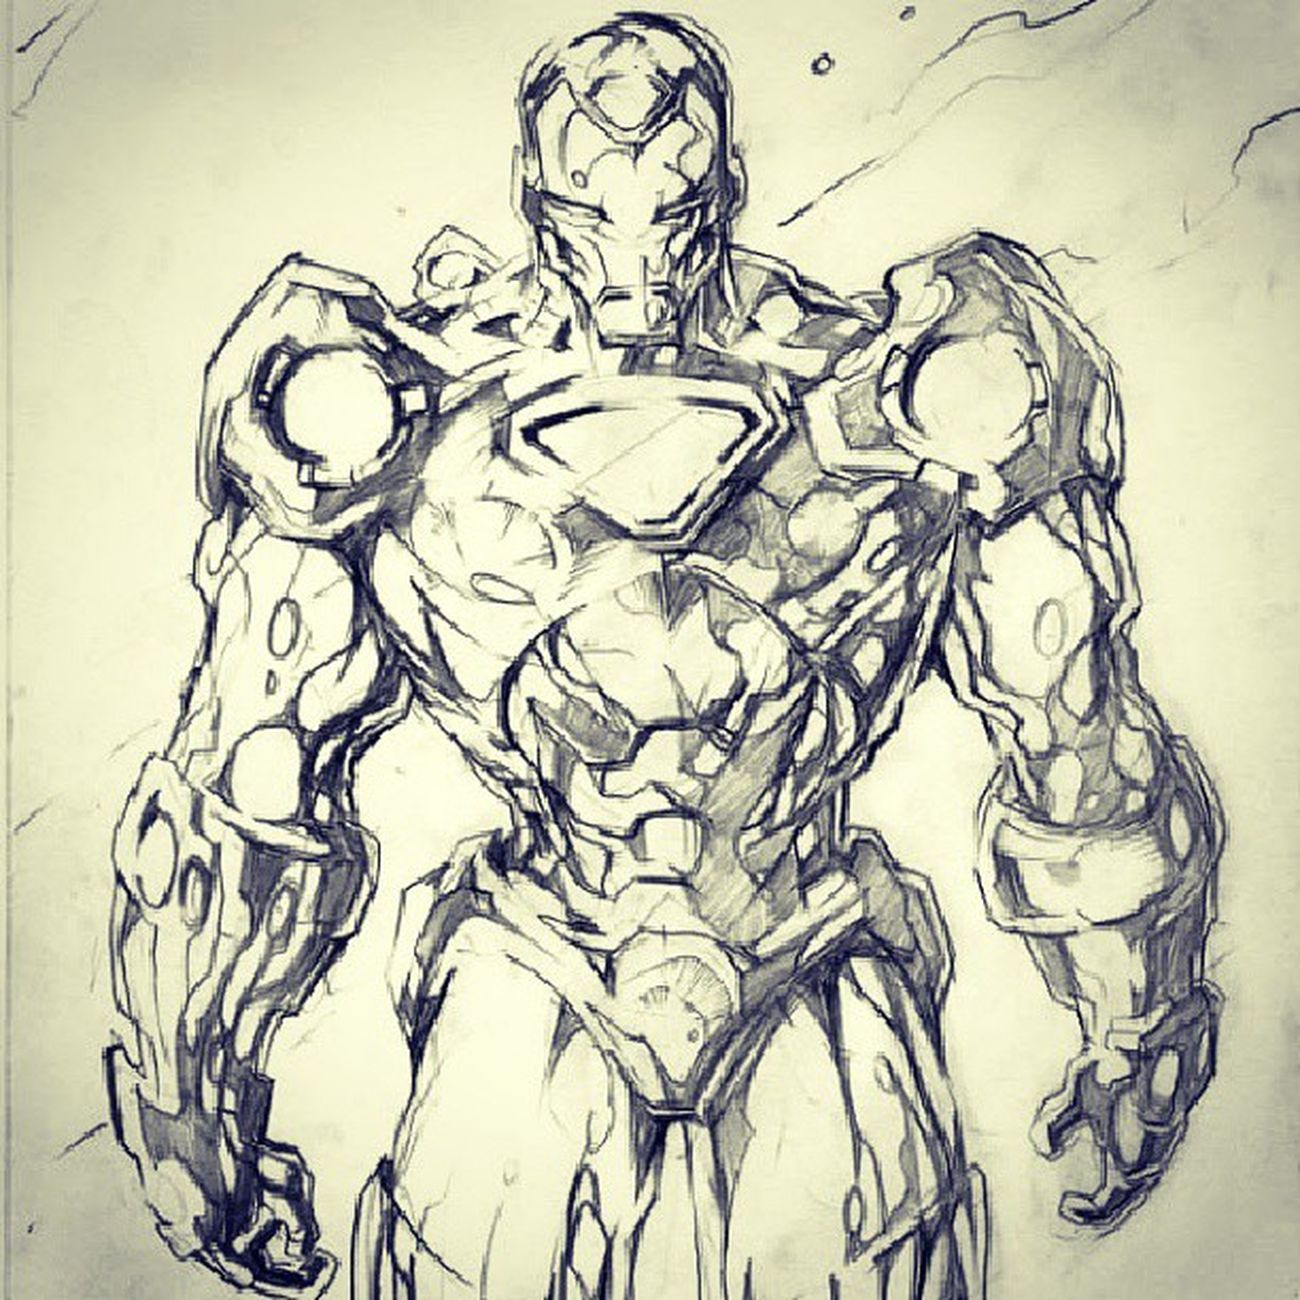 Orek-orek berhadiah Art Skets Ironman Pencils